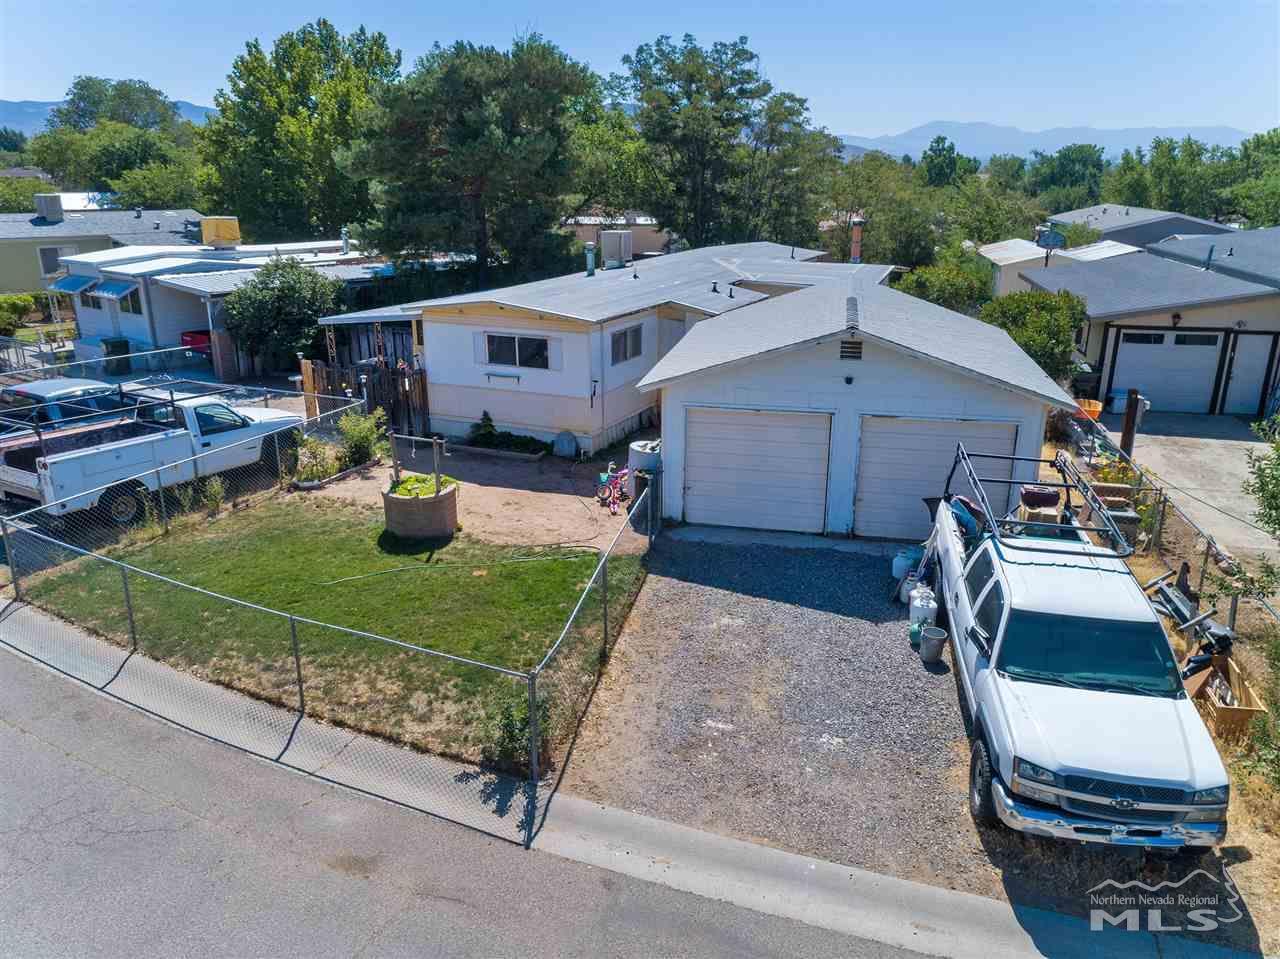 Image for 3440 Basalt Drive, Carson City, NV 89705